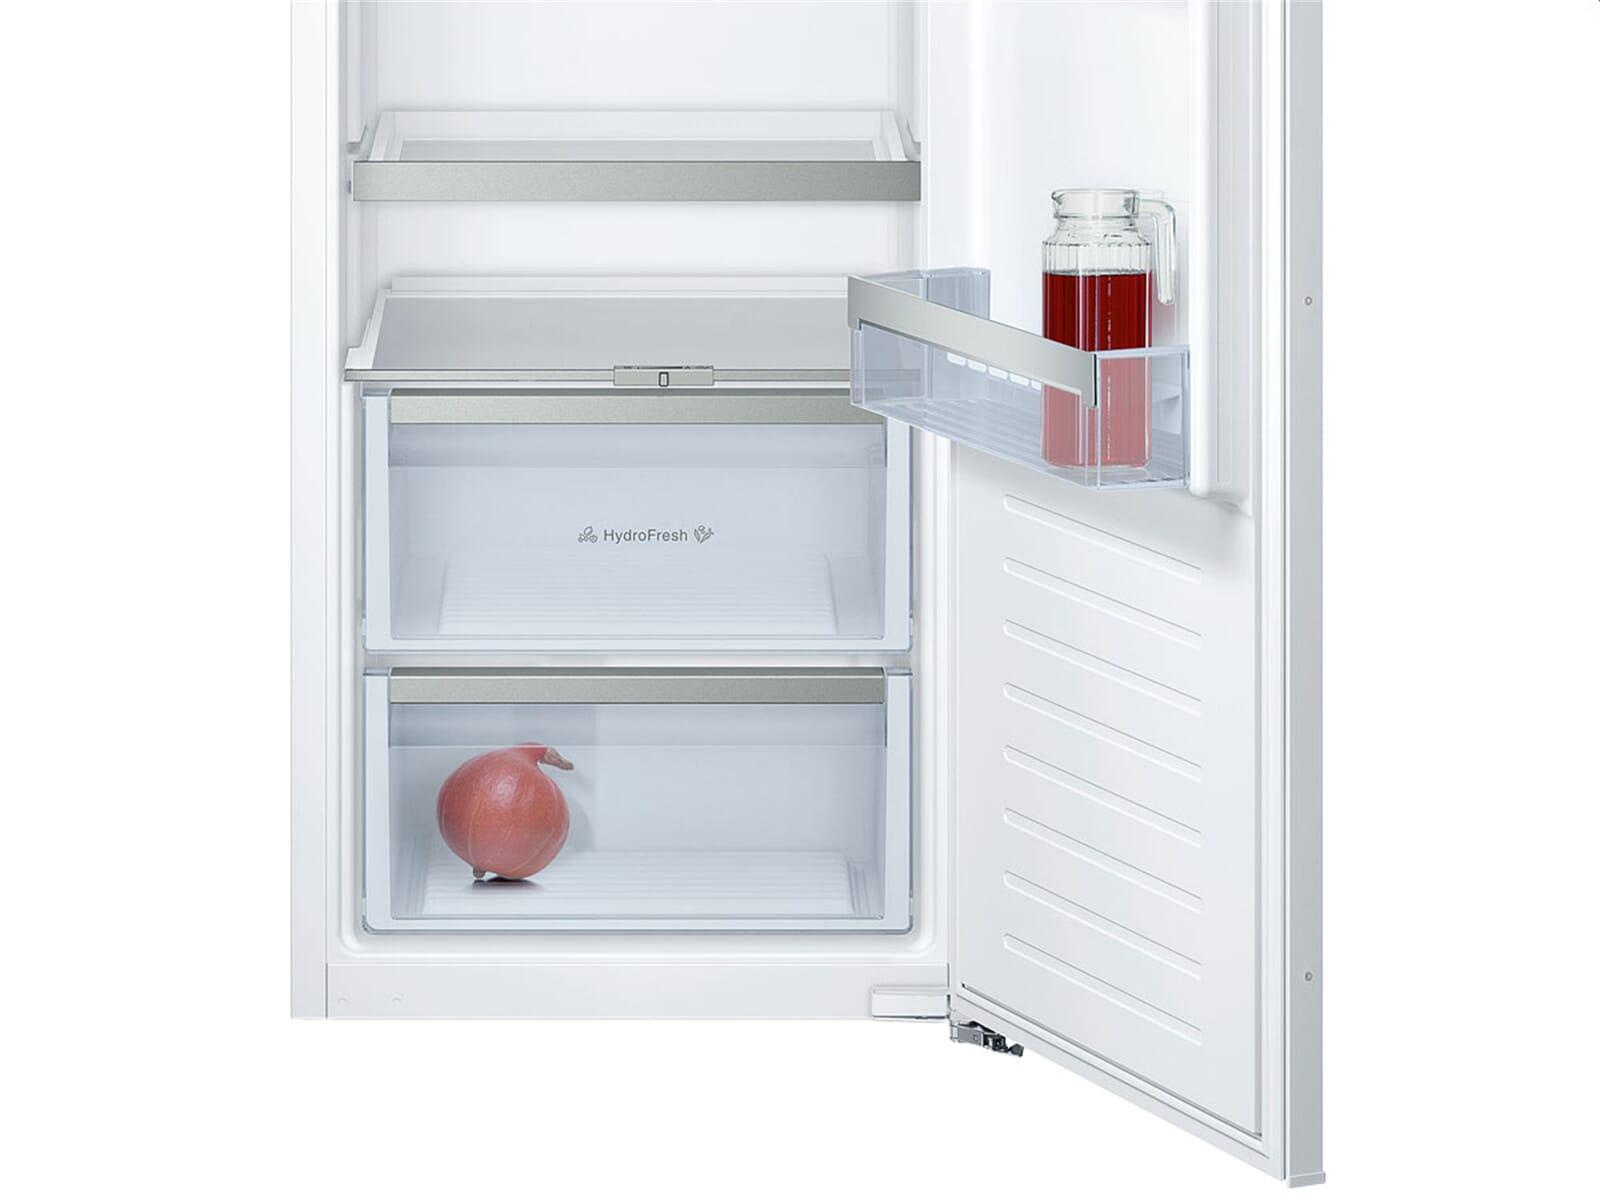 Kühlschrank Neff : Einbau kühlschrank kombi neff k a einbau kühlschrank für